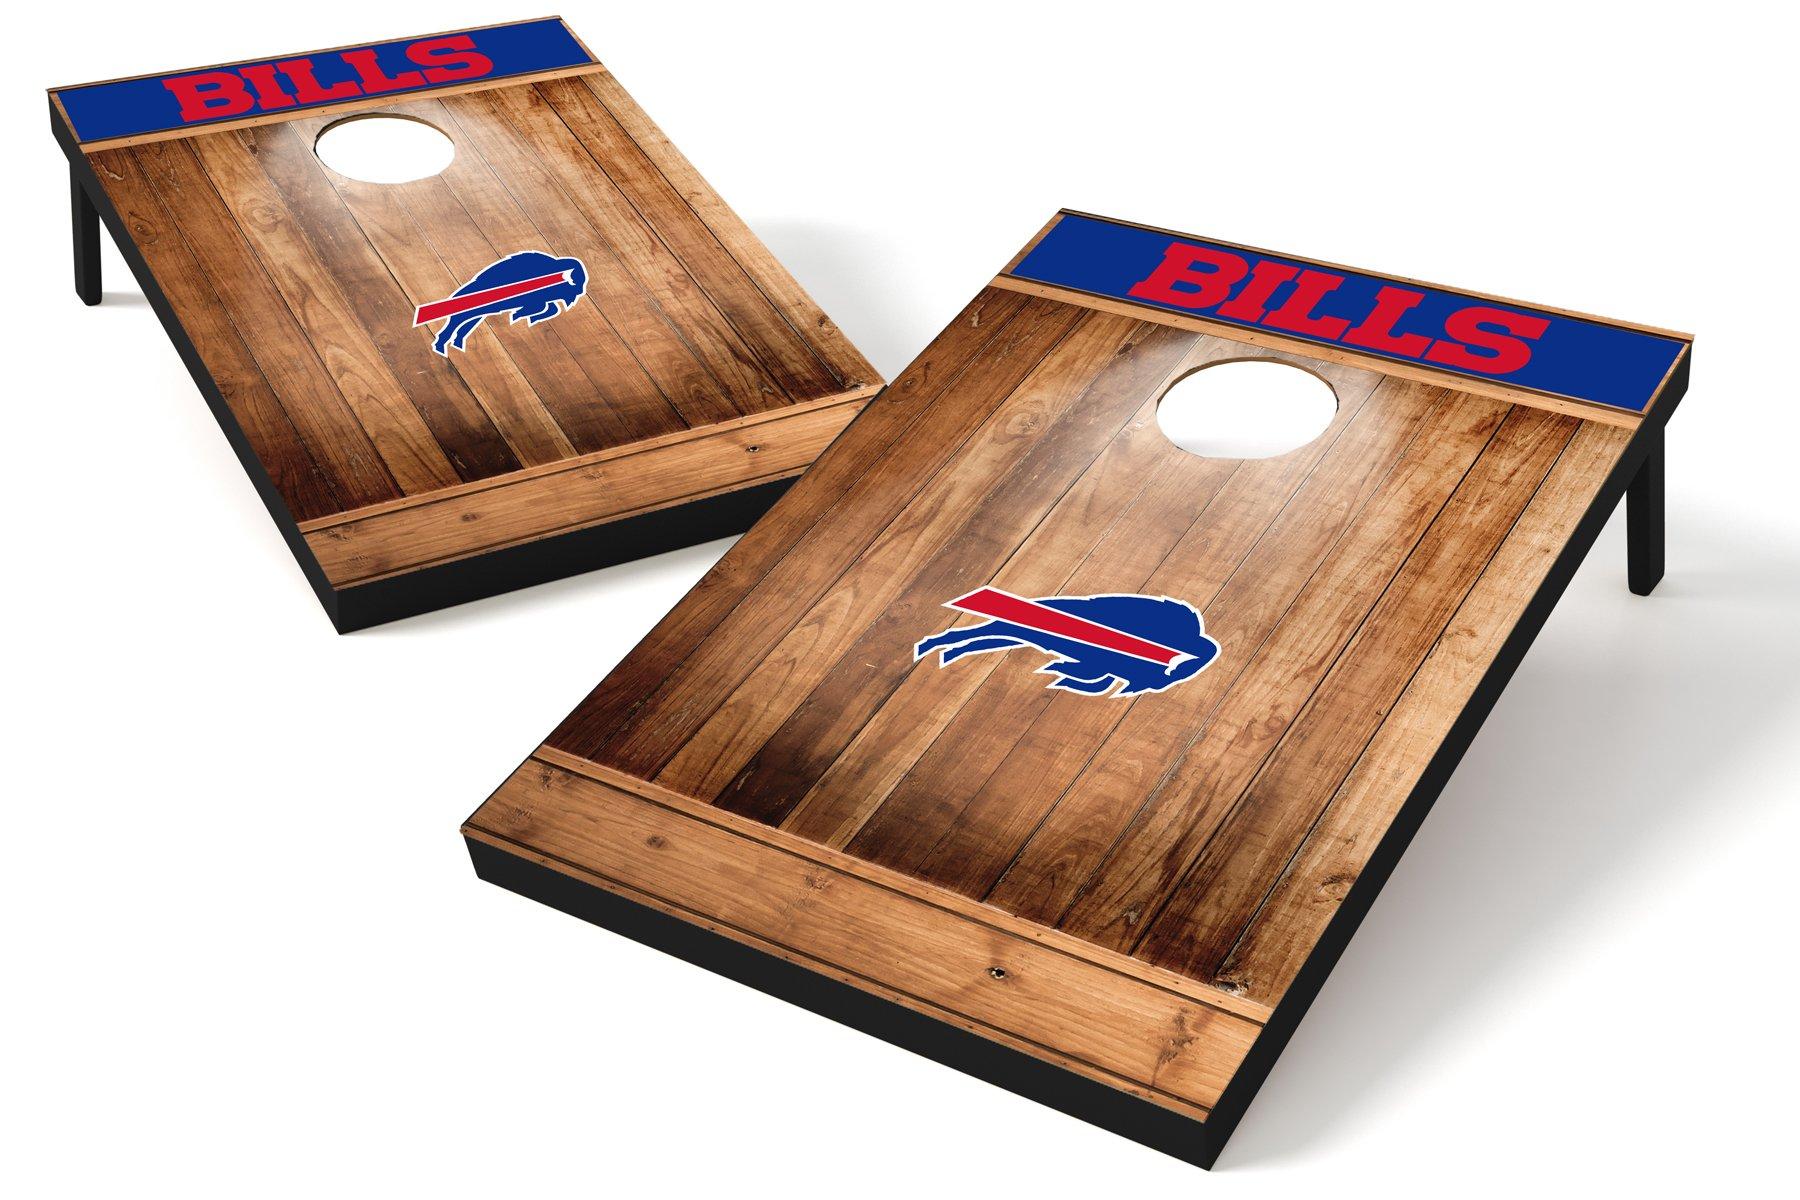 Wild Sports NFL Buffalo Bills 2'x3' Cornhole Set - Brown Wood Design